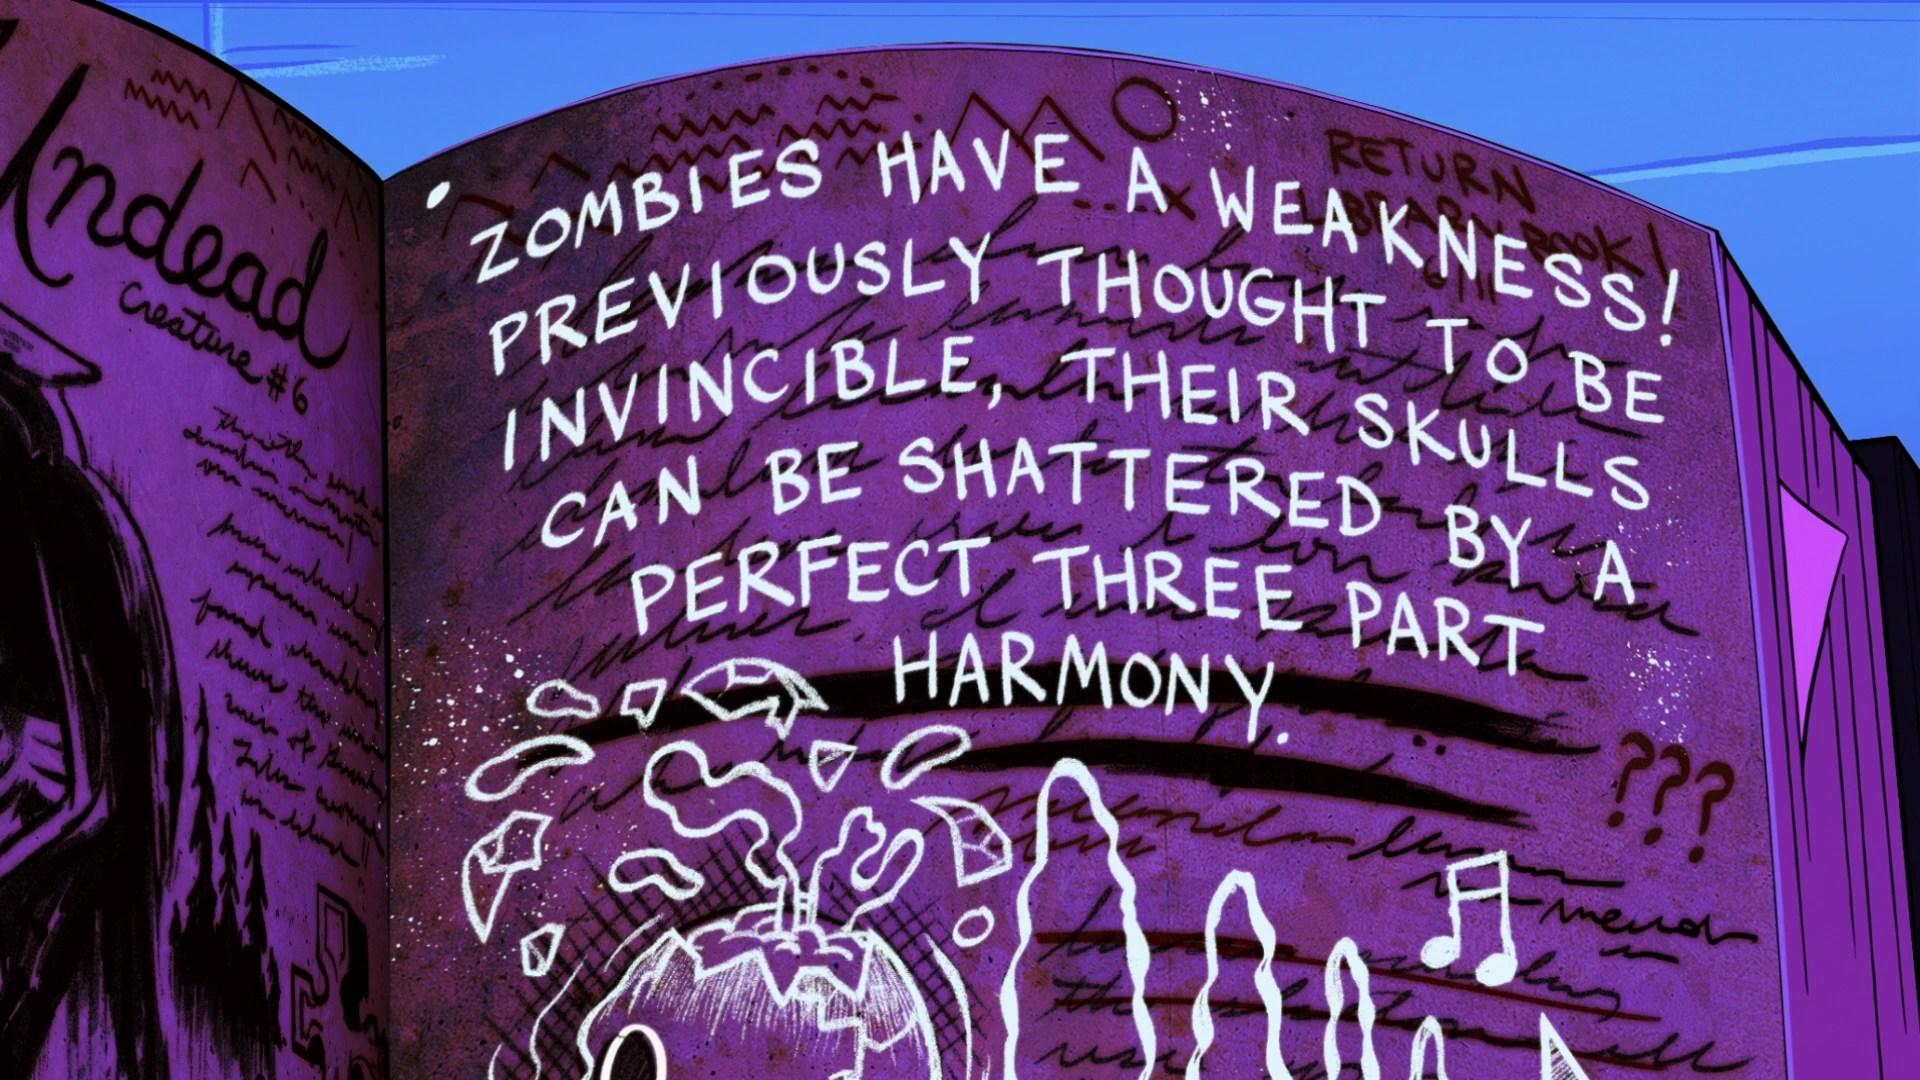 Gravity Falls Wallpaper Trust No One Image S2e1 Zombie Weakness Png Gravity Falls Wiki